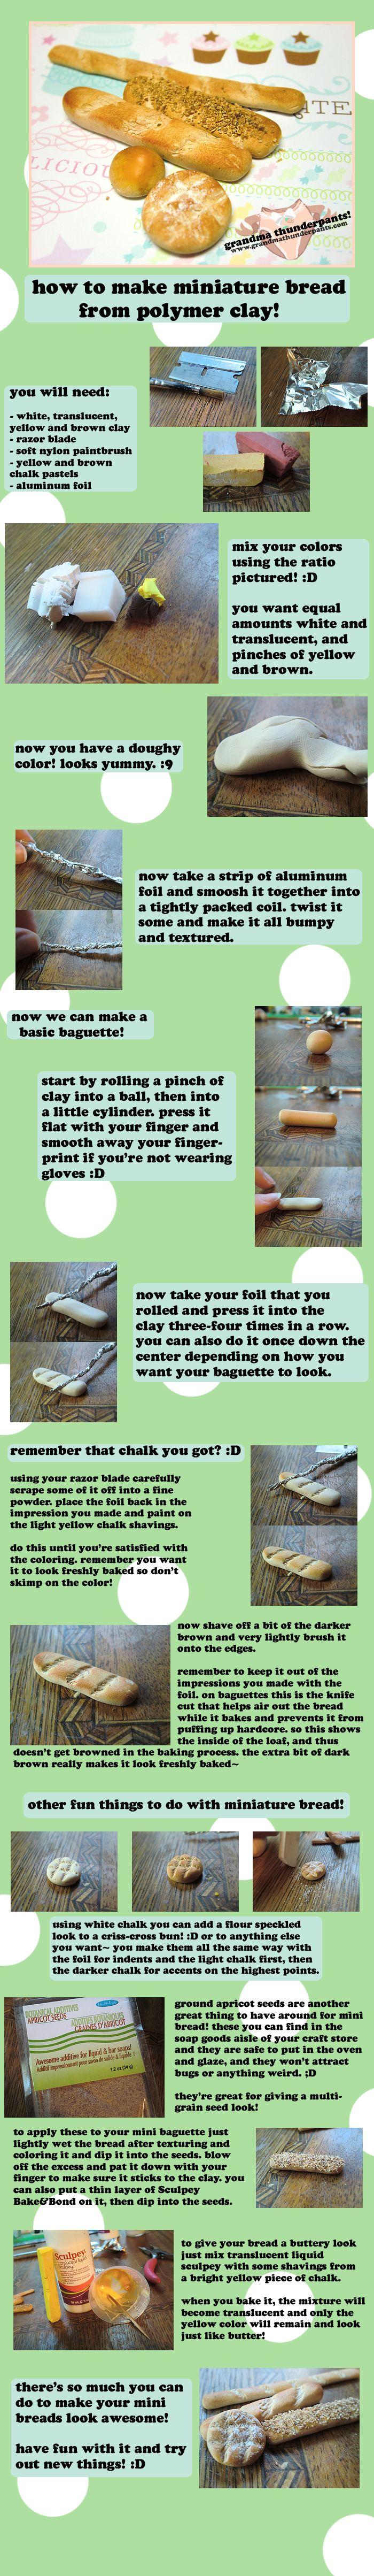 Miniature Clay Bread TUTORIAL by *GrandmaThunderpants on deviantART